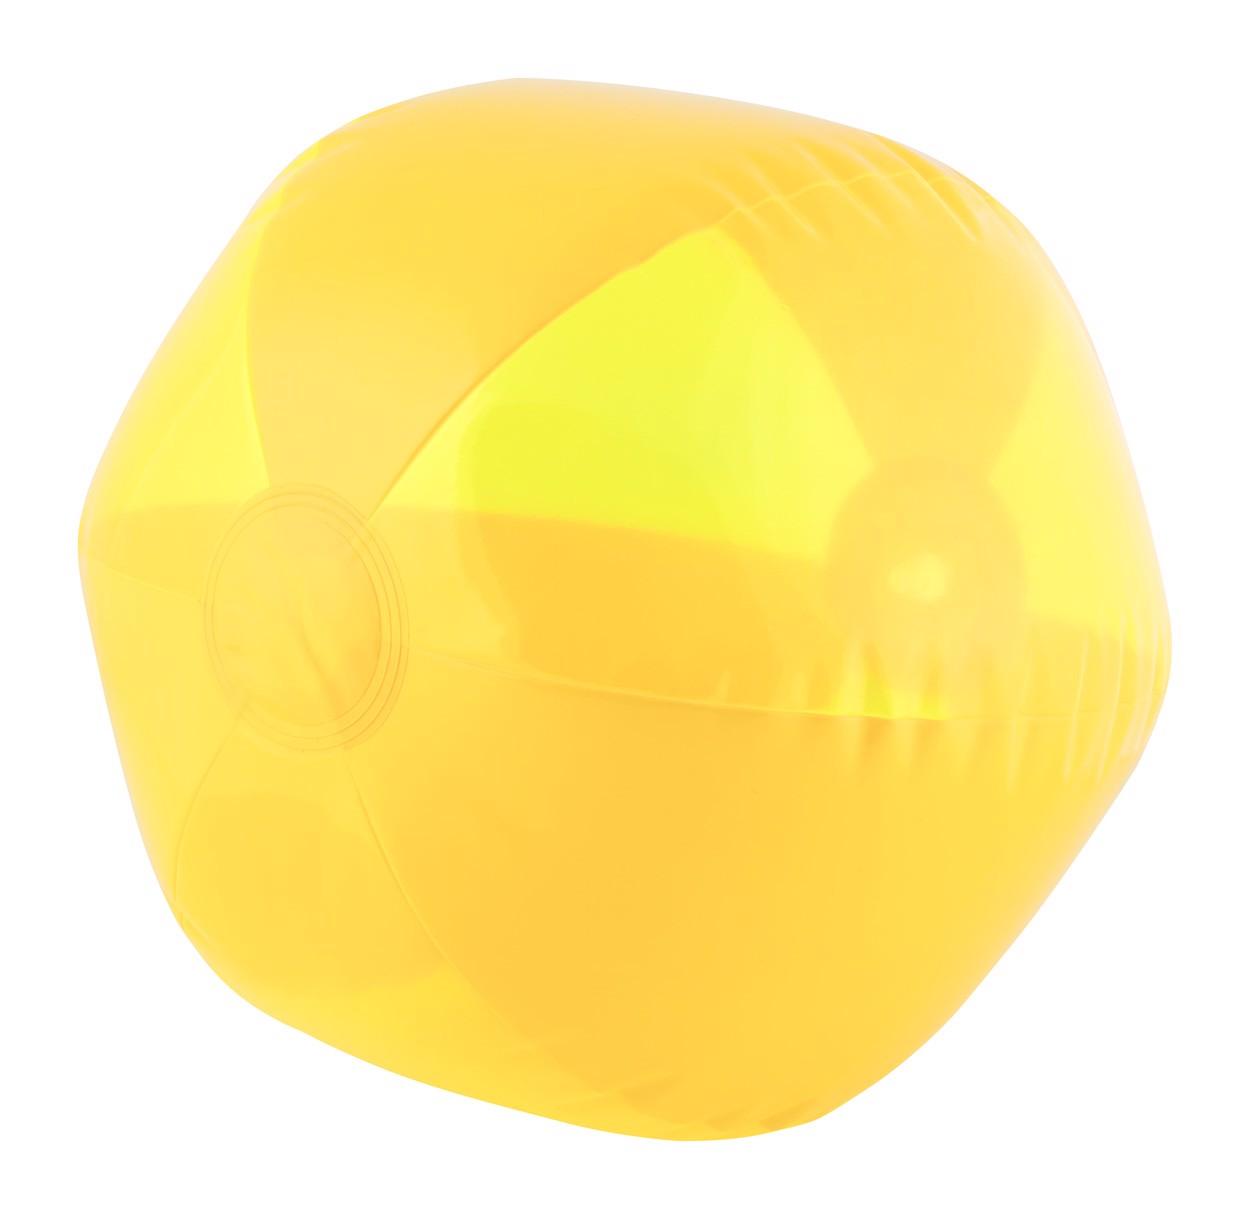 Plážový Míč (Ø26 Cm) Navagio - Žlutá